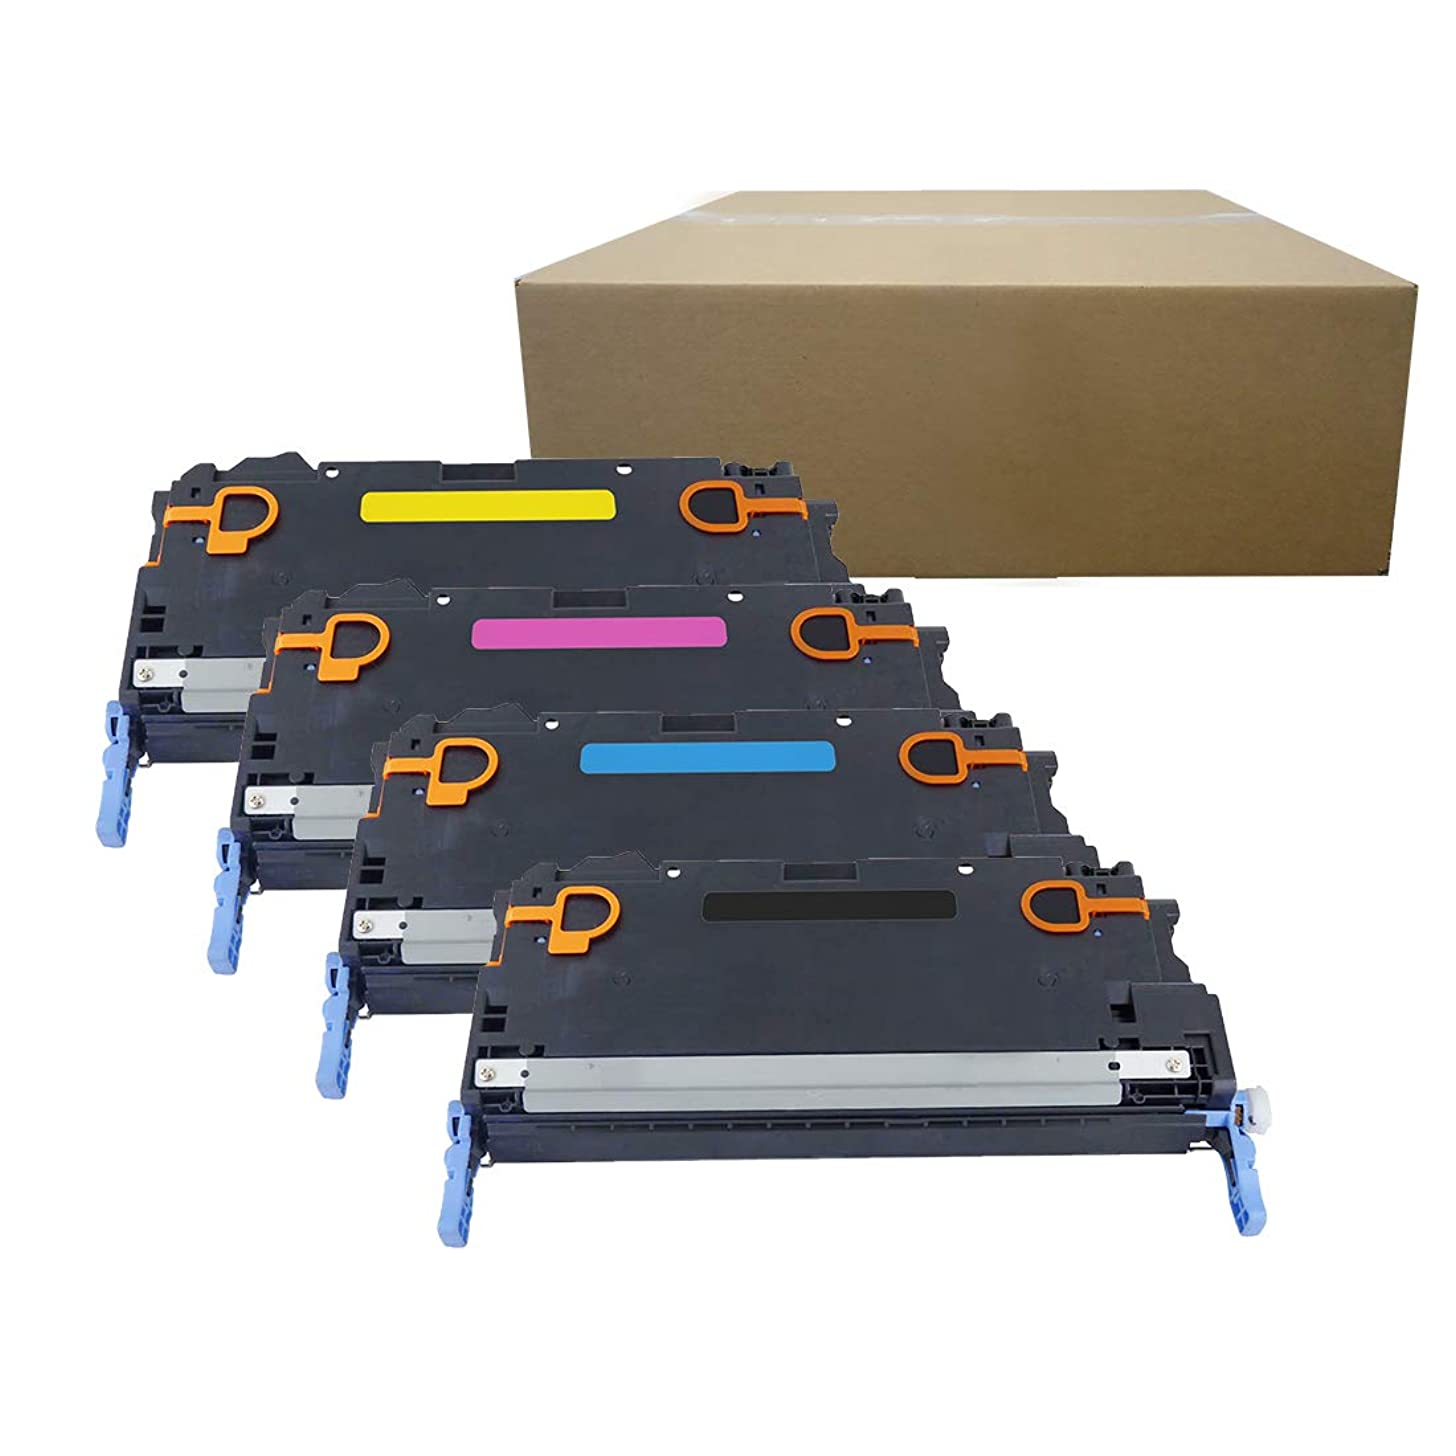 Inktoneram Compatible Toner Cartridges Replacement for HP 3800 501A 503A Q6470A Q7581A Q7583A Q7582A Color LaserJet 3800dn 3800dtn 3800n CP3505dn CP3505n CP3505x ([Black,Cyan,Magenta,Yellow], 4-Pack)